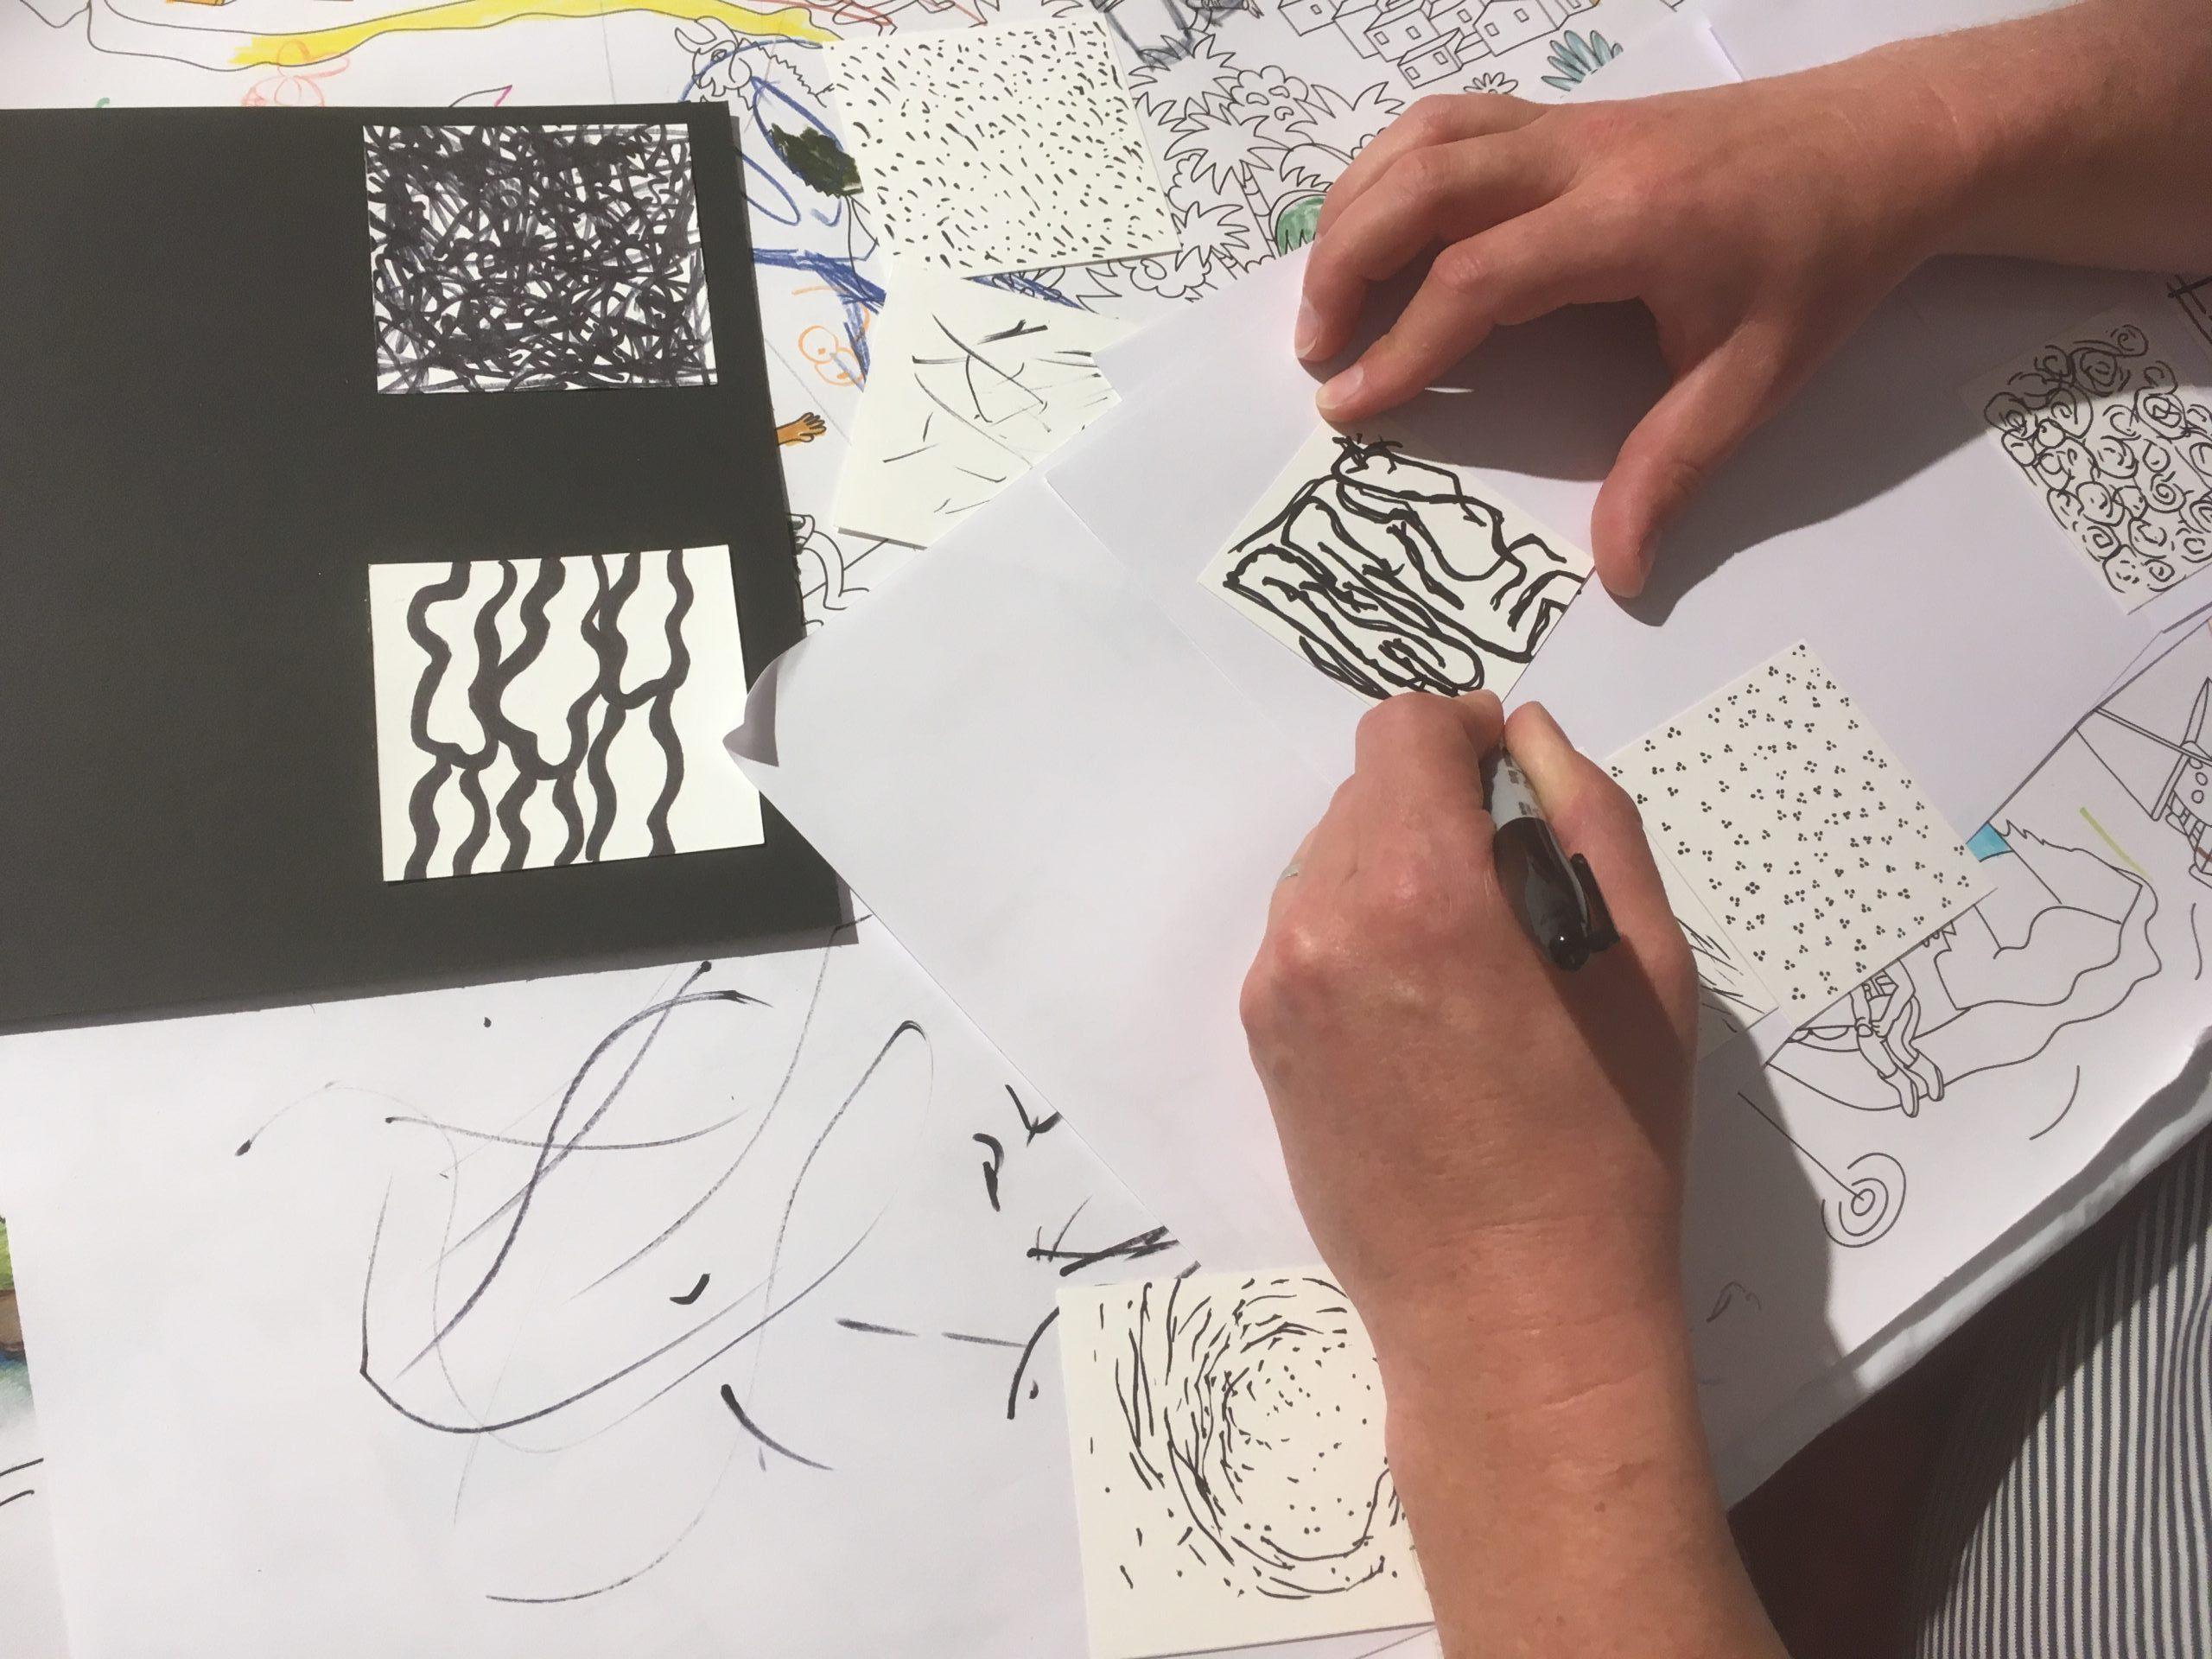 dot-art (Online): Drawing Techniques